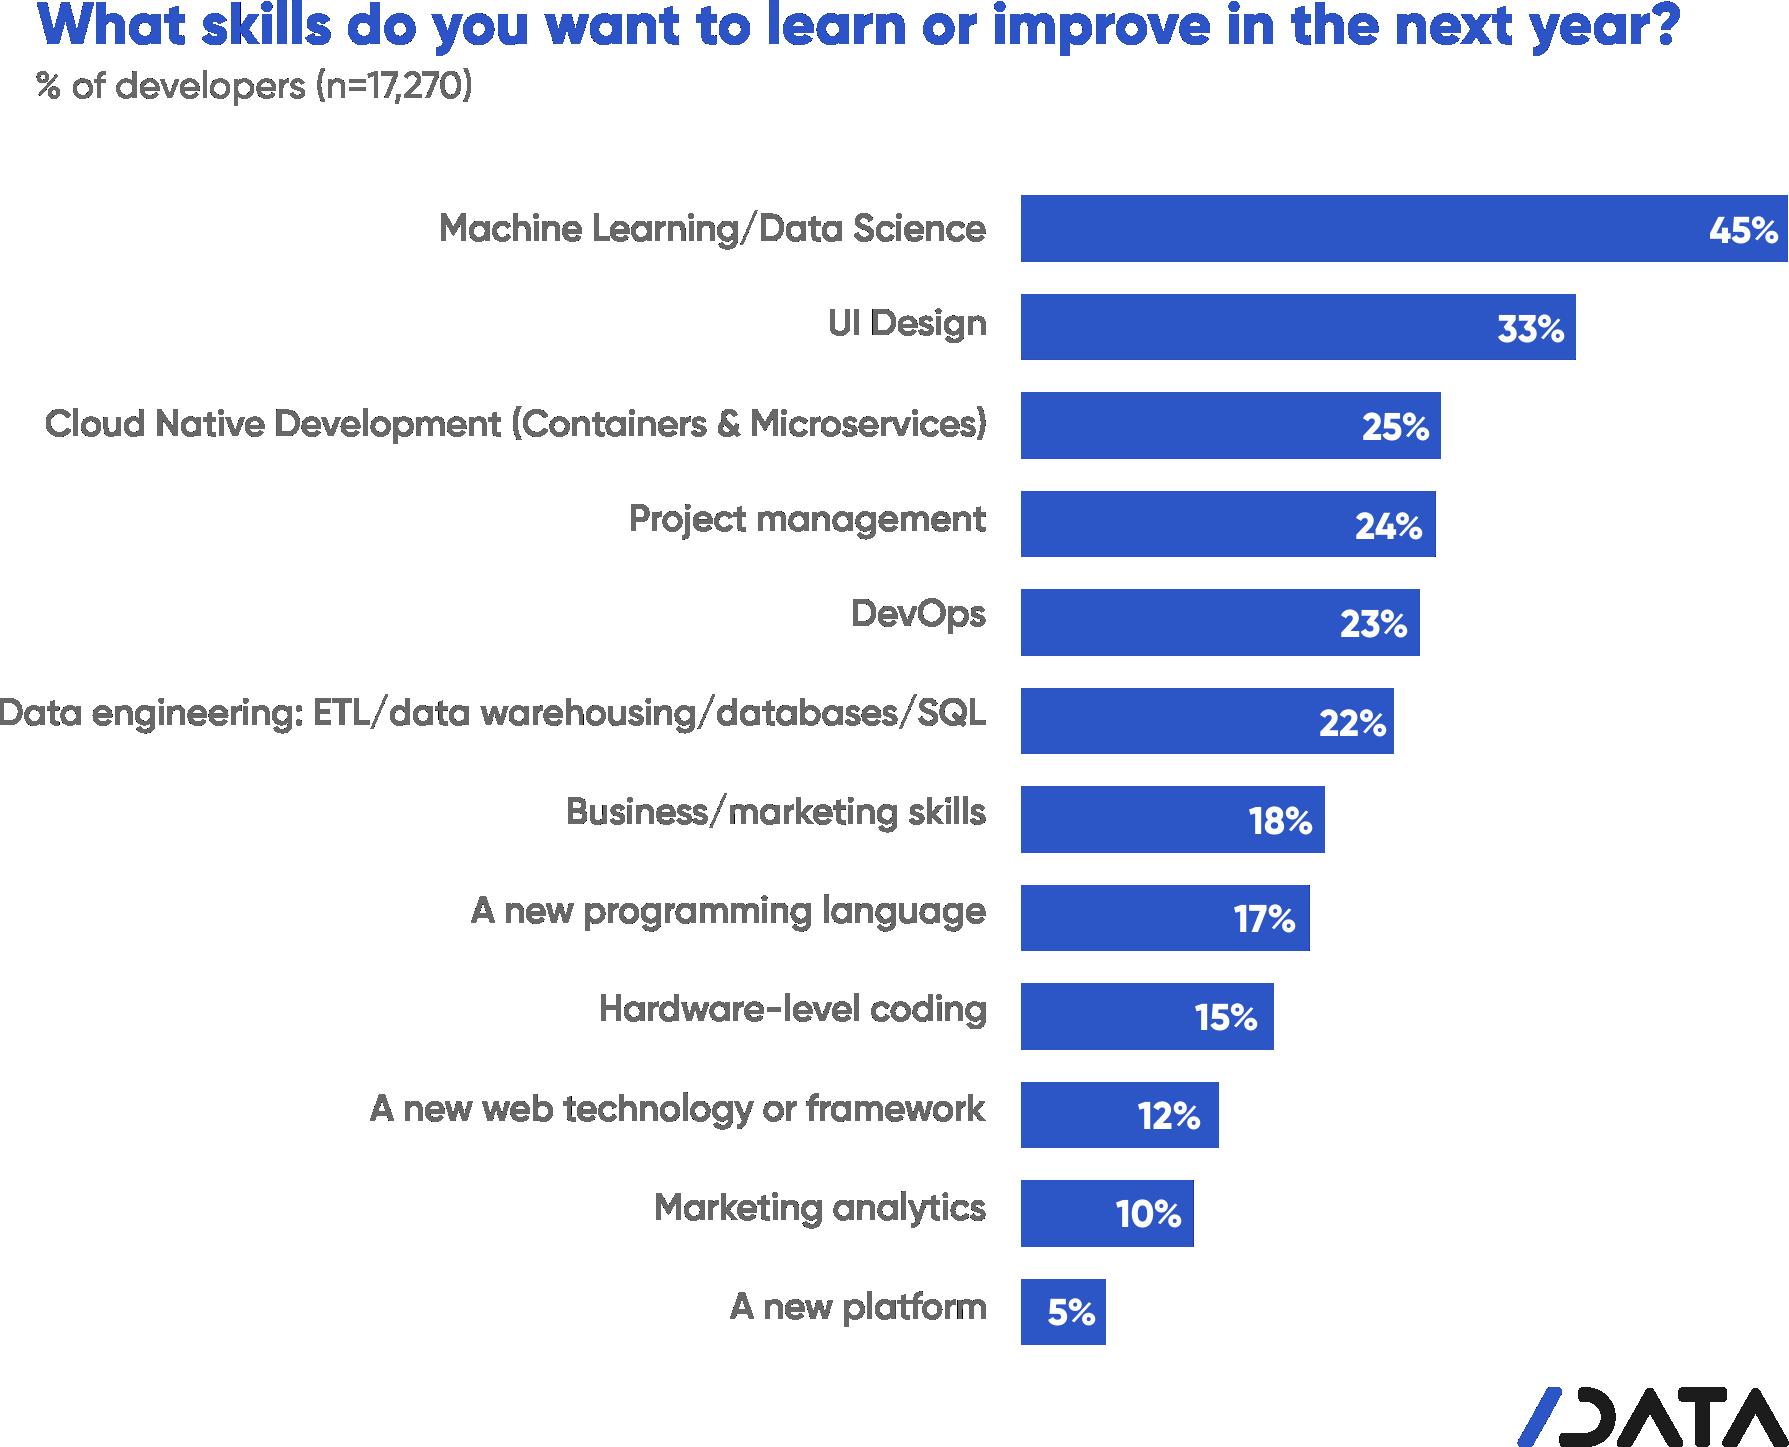 developer skills 2019, data science, machine learning, developer trends, software development, developer research, developer survey, state of developer nation, slashdata